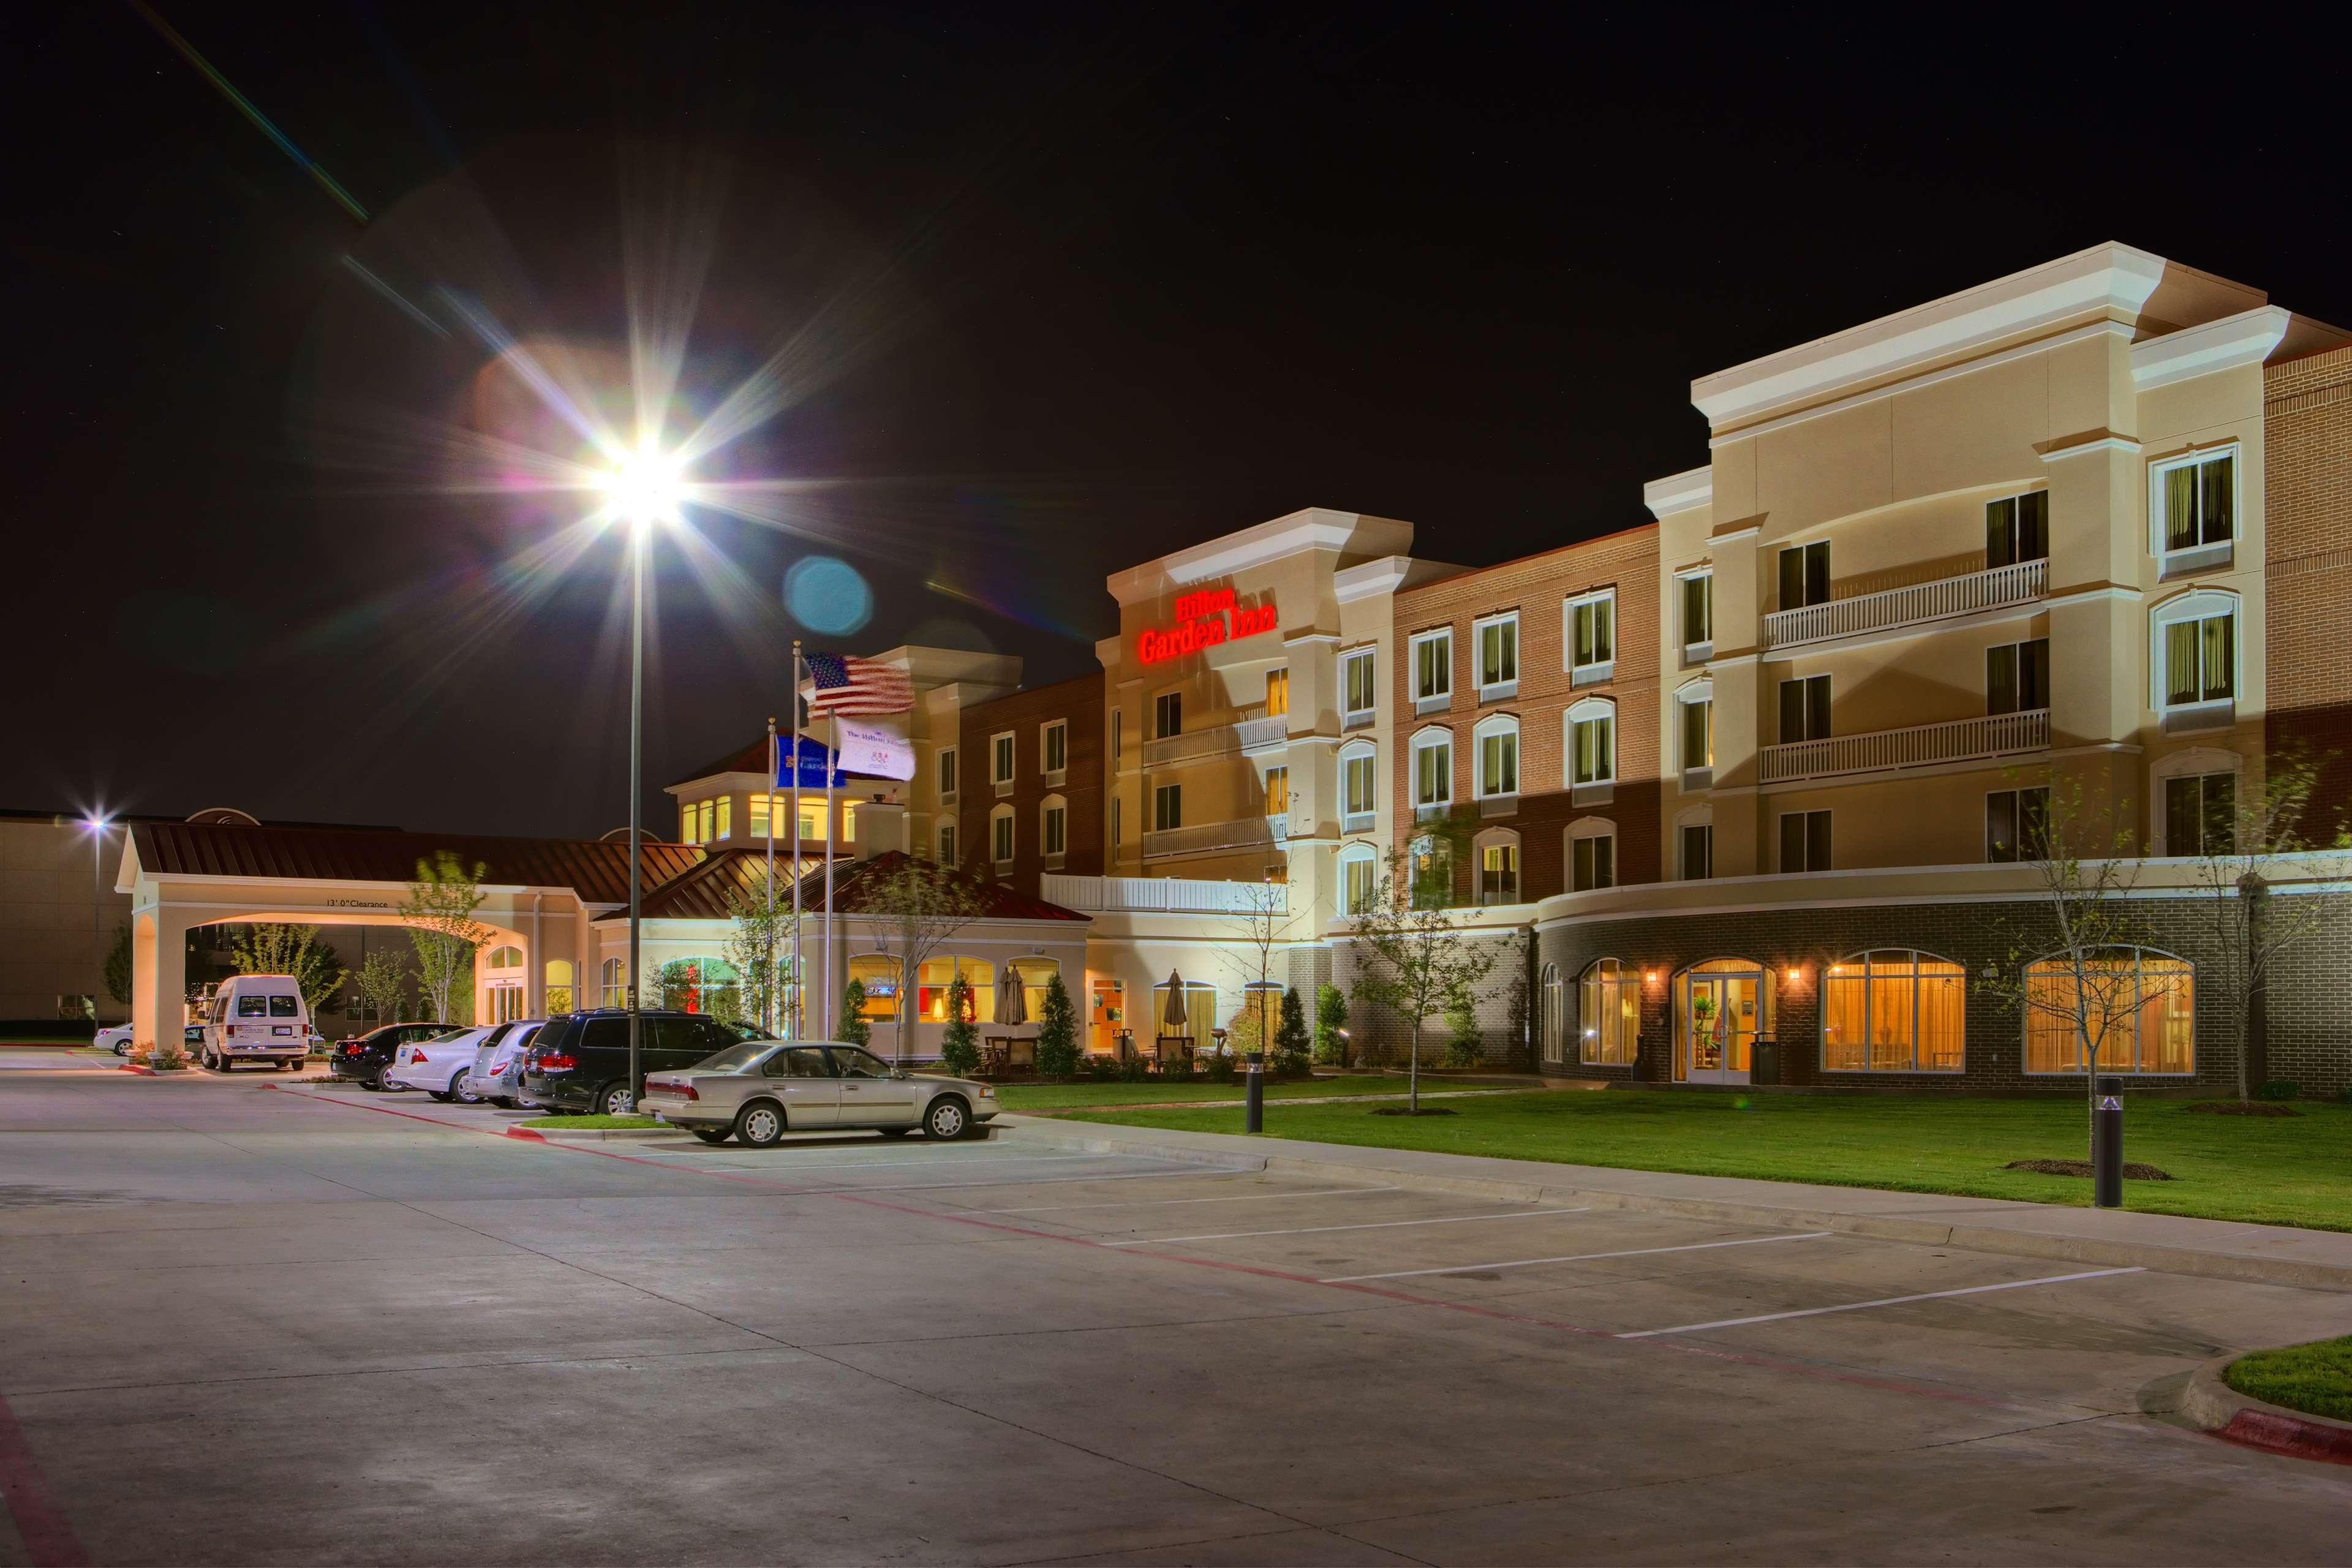 Hilton Garden Inn DFW North Grapevine image 2